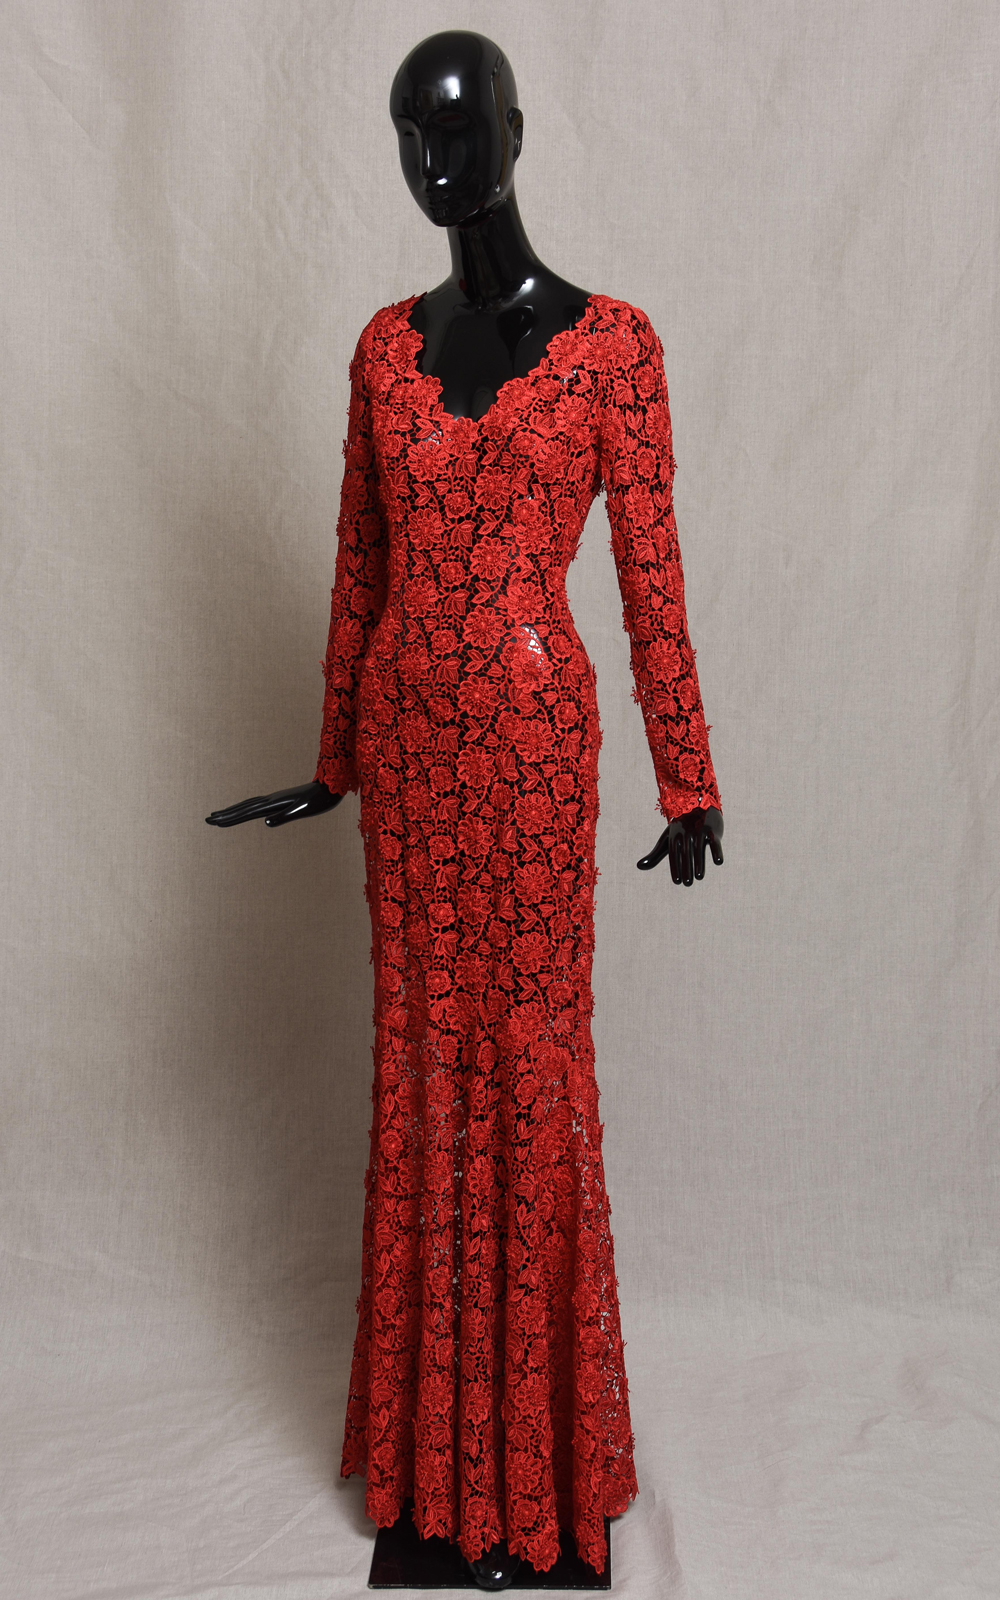 ZARA Guipure lace dress